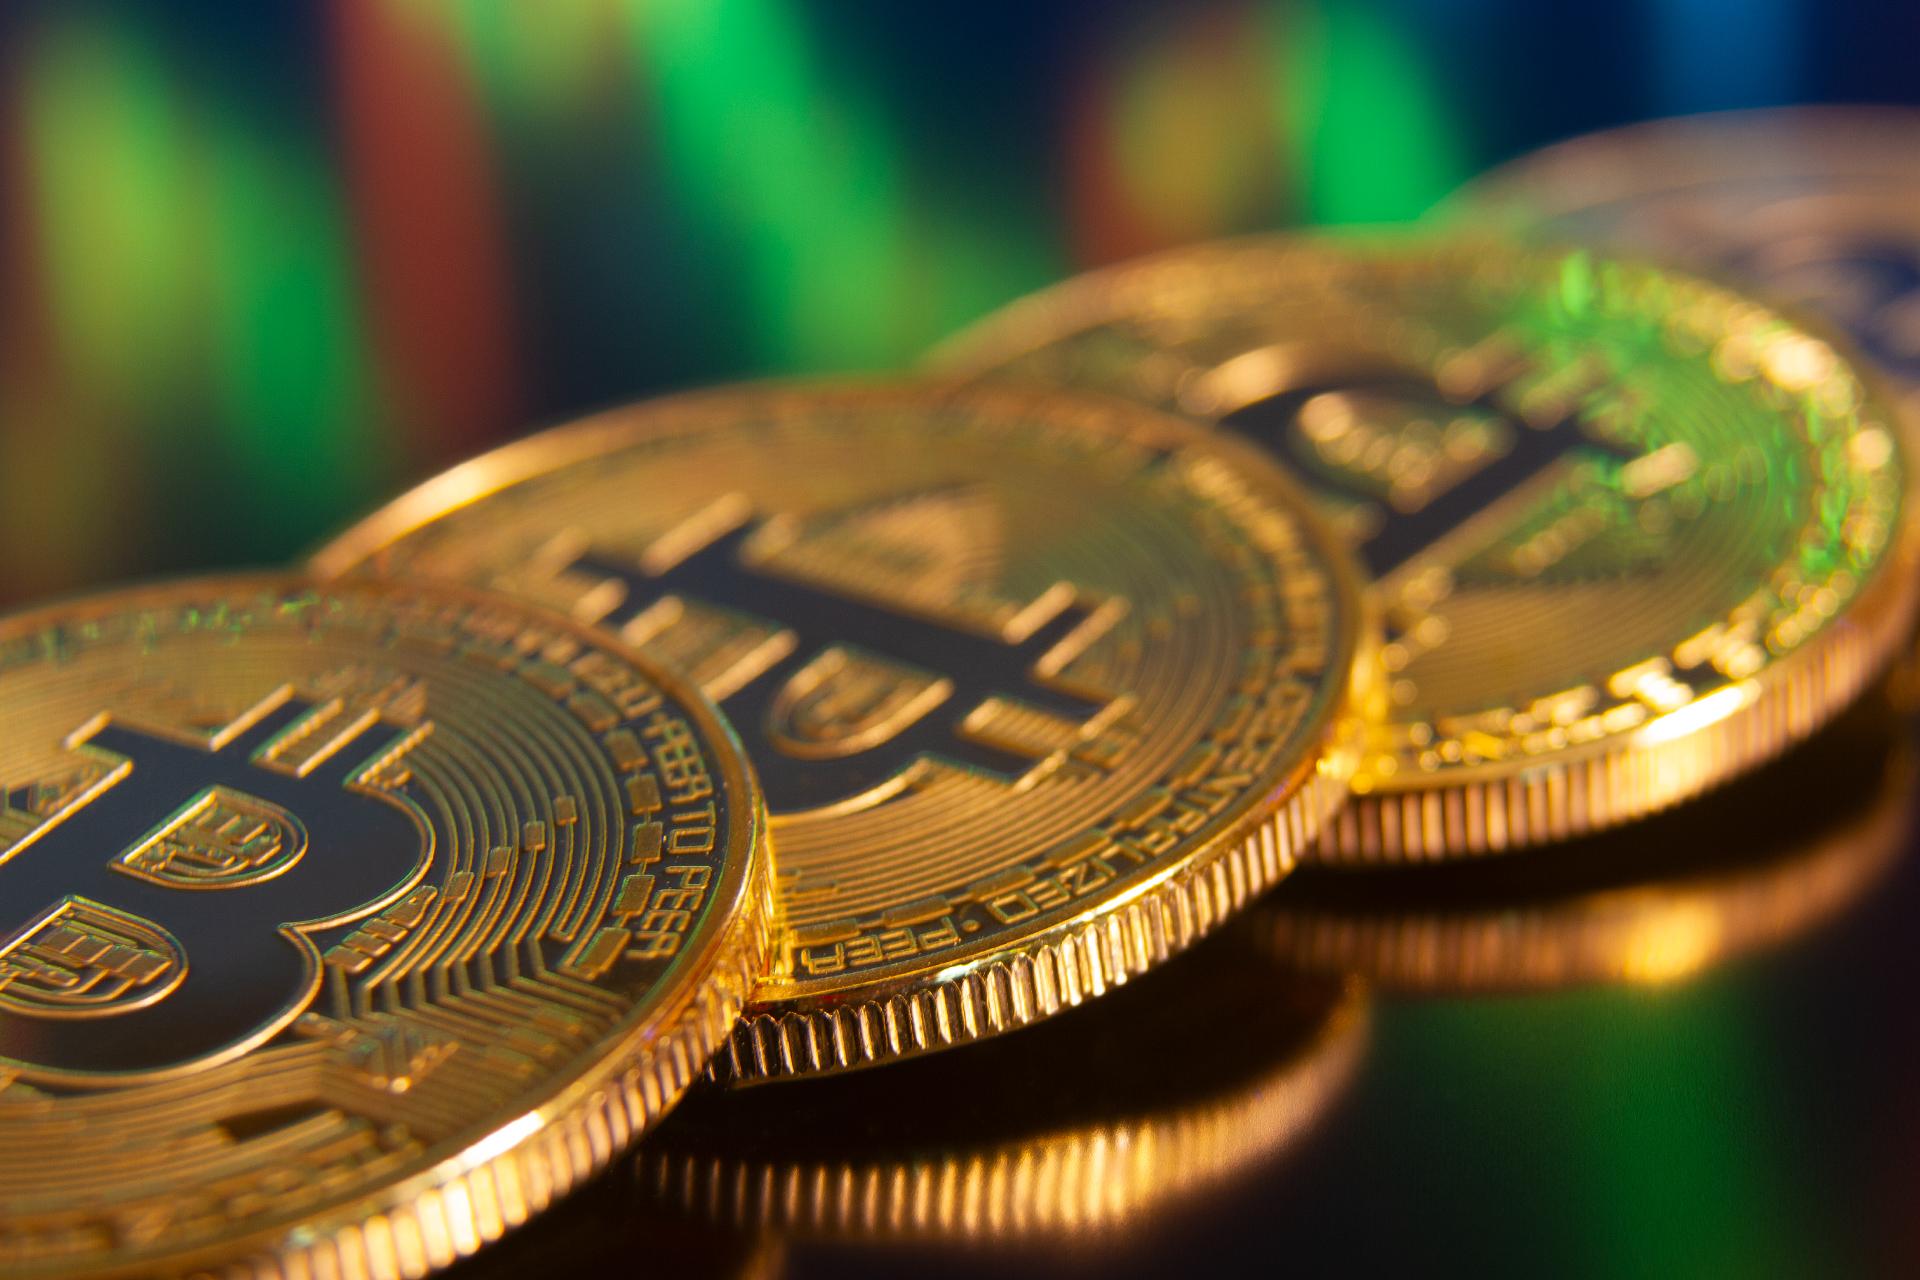 Row of Bitcoins reflecting stock charts free image download